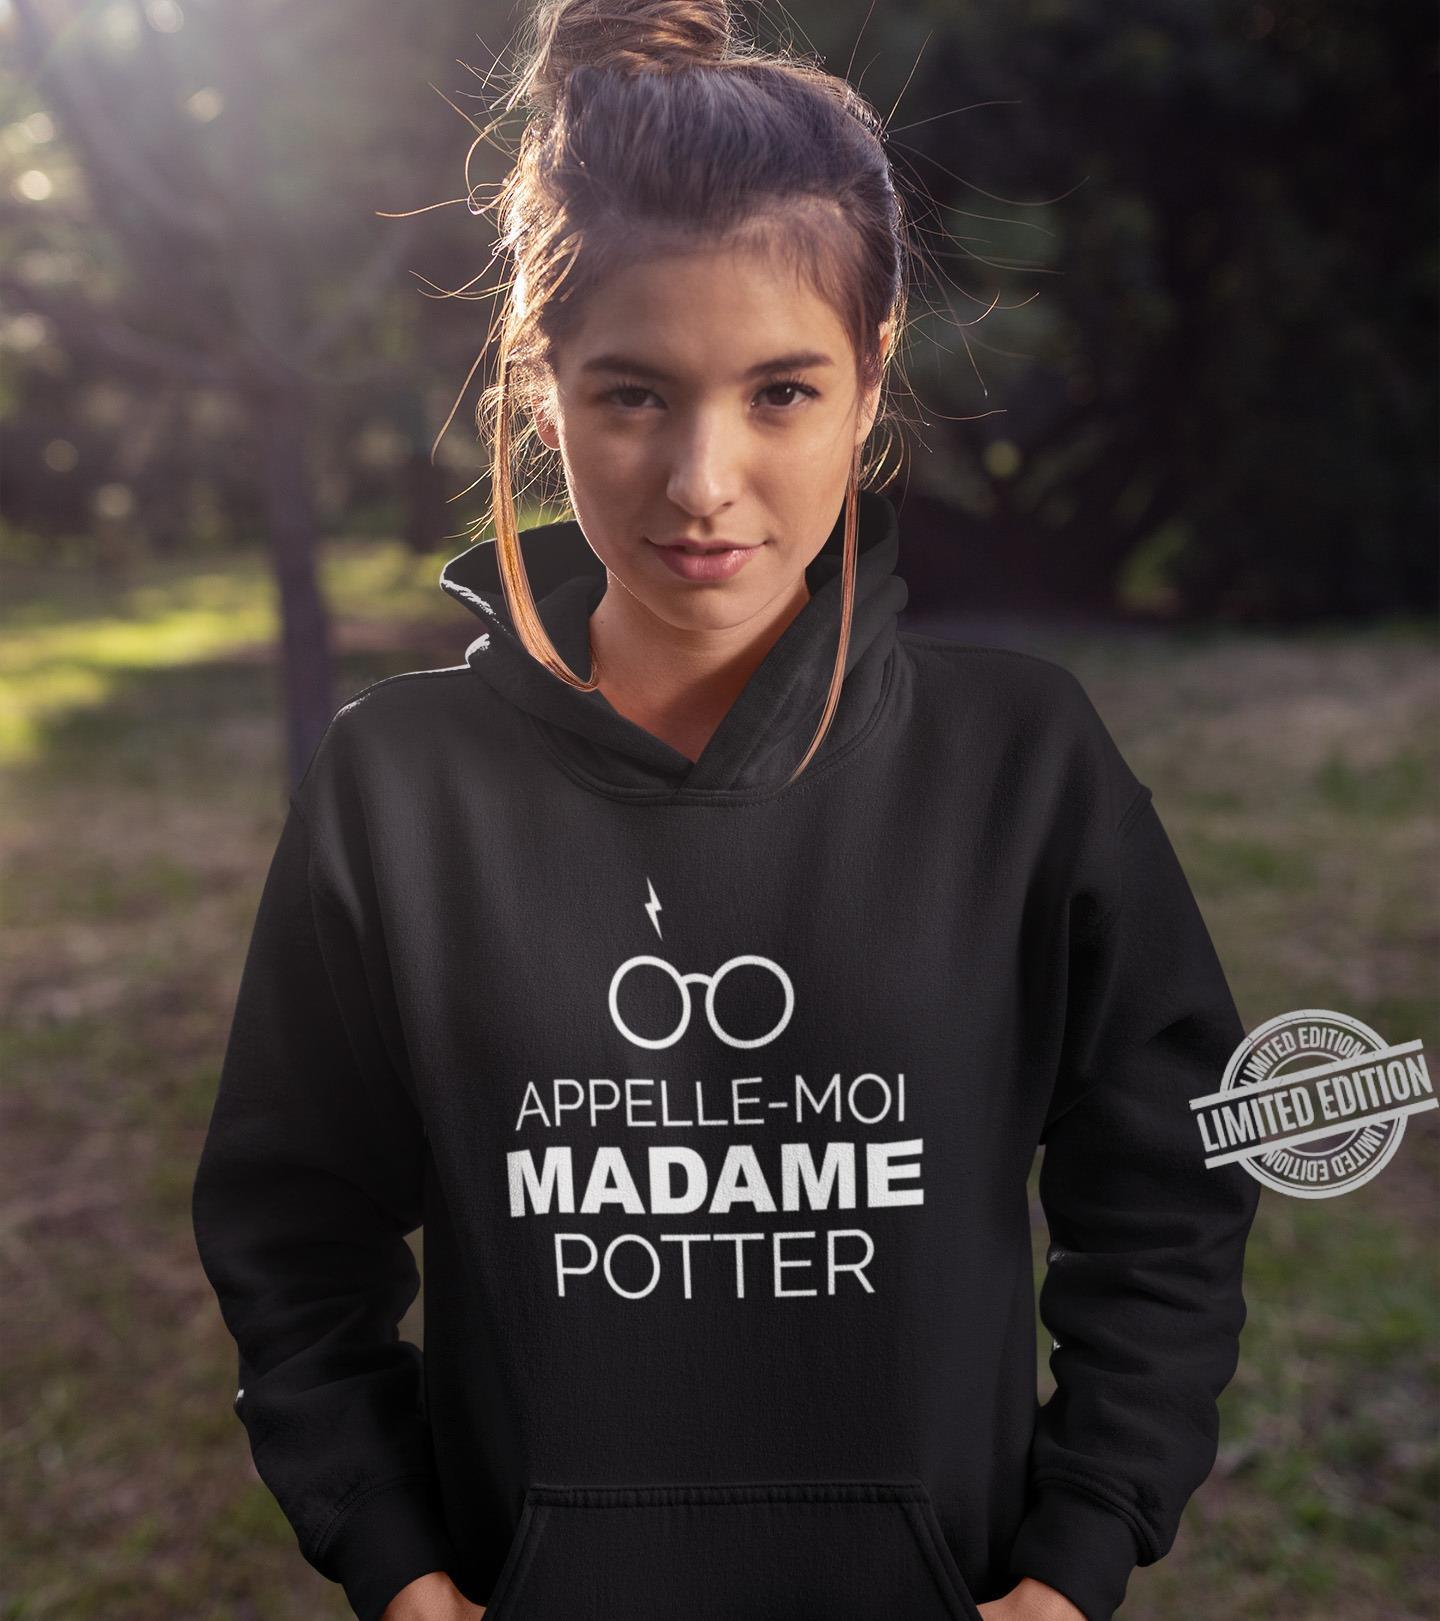 Appelle-Moi Madame Potter Shirt